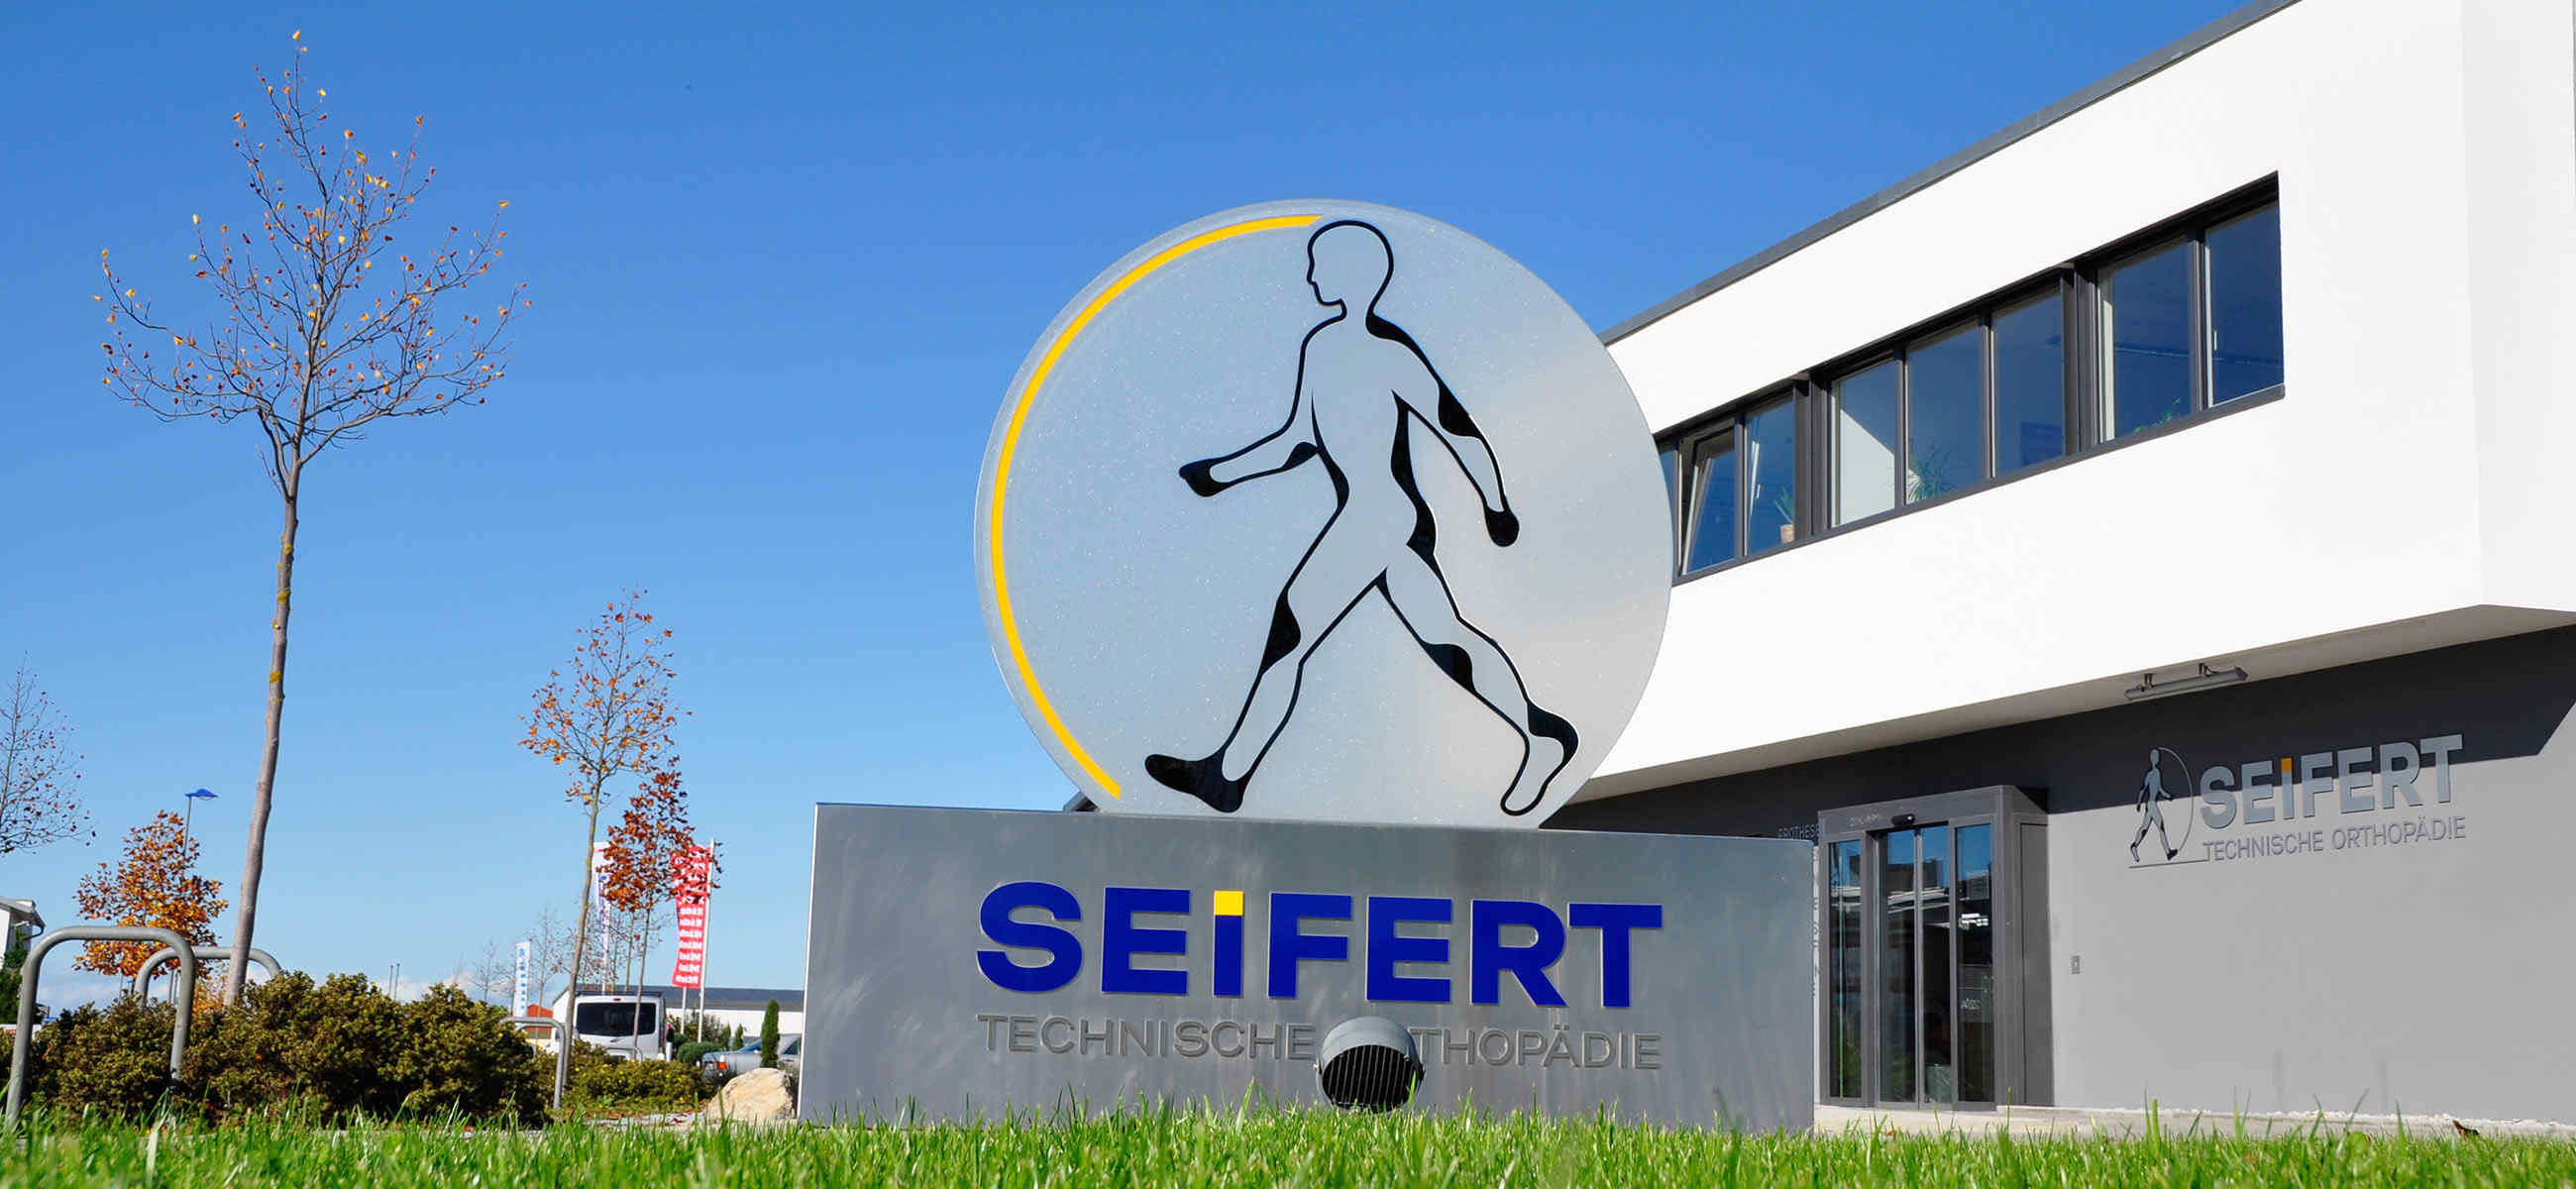 Seifert_Technische_Orthopaedie-Gebaeude